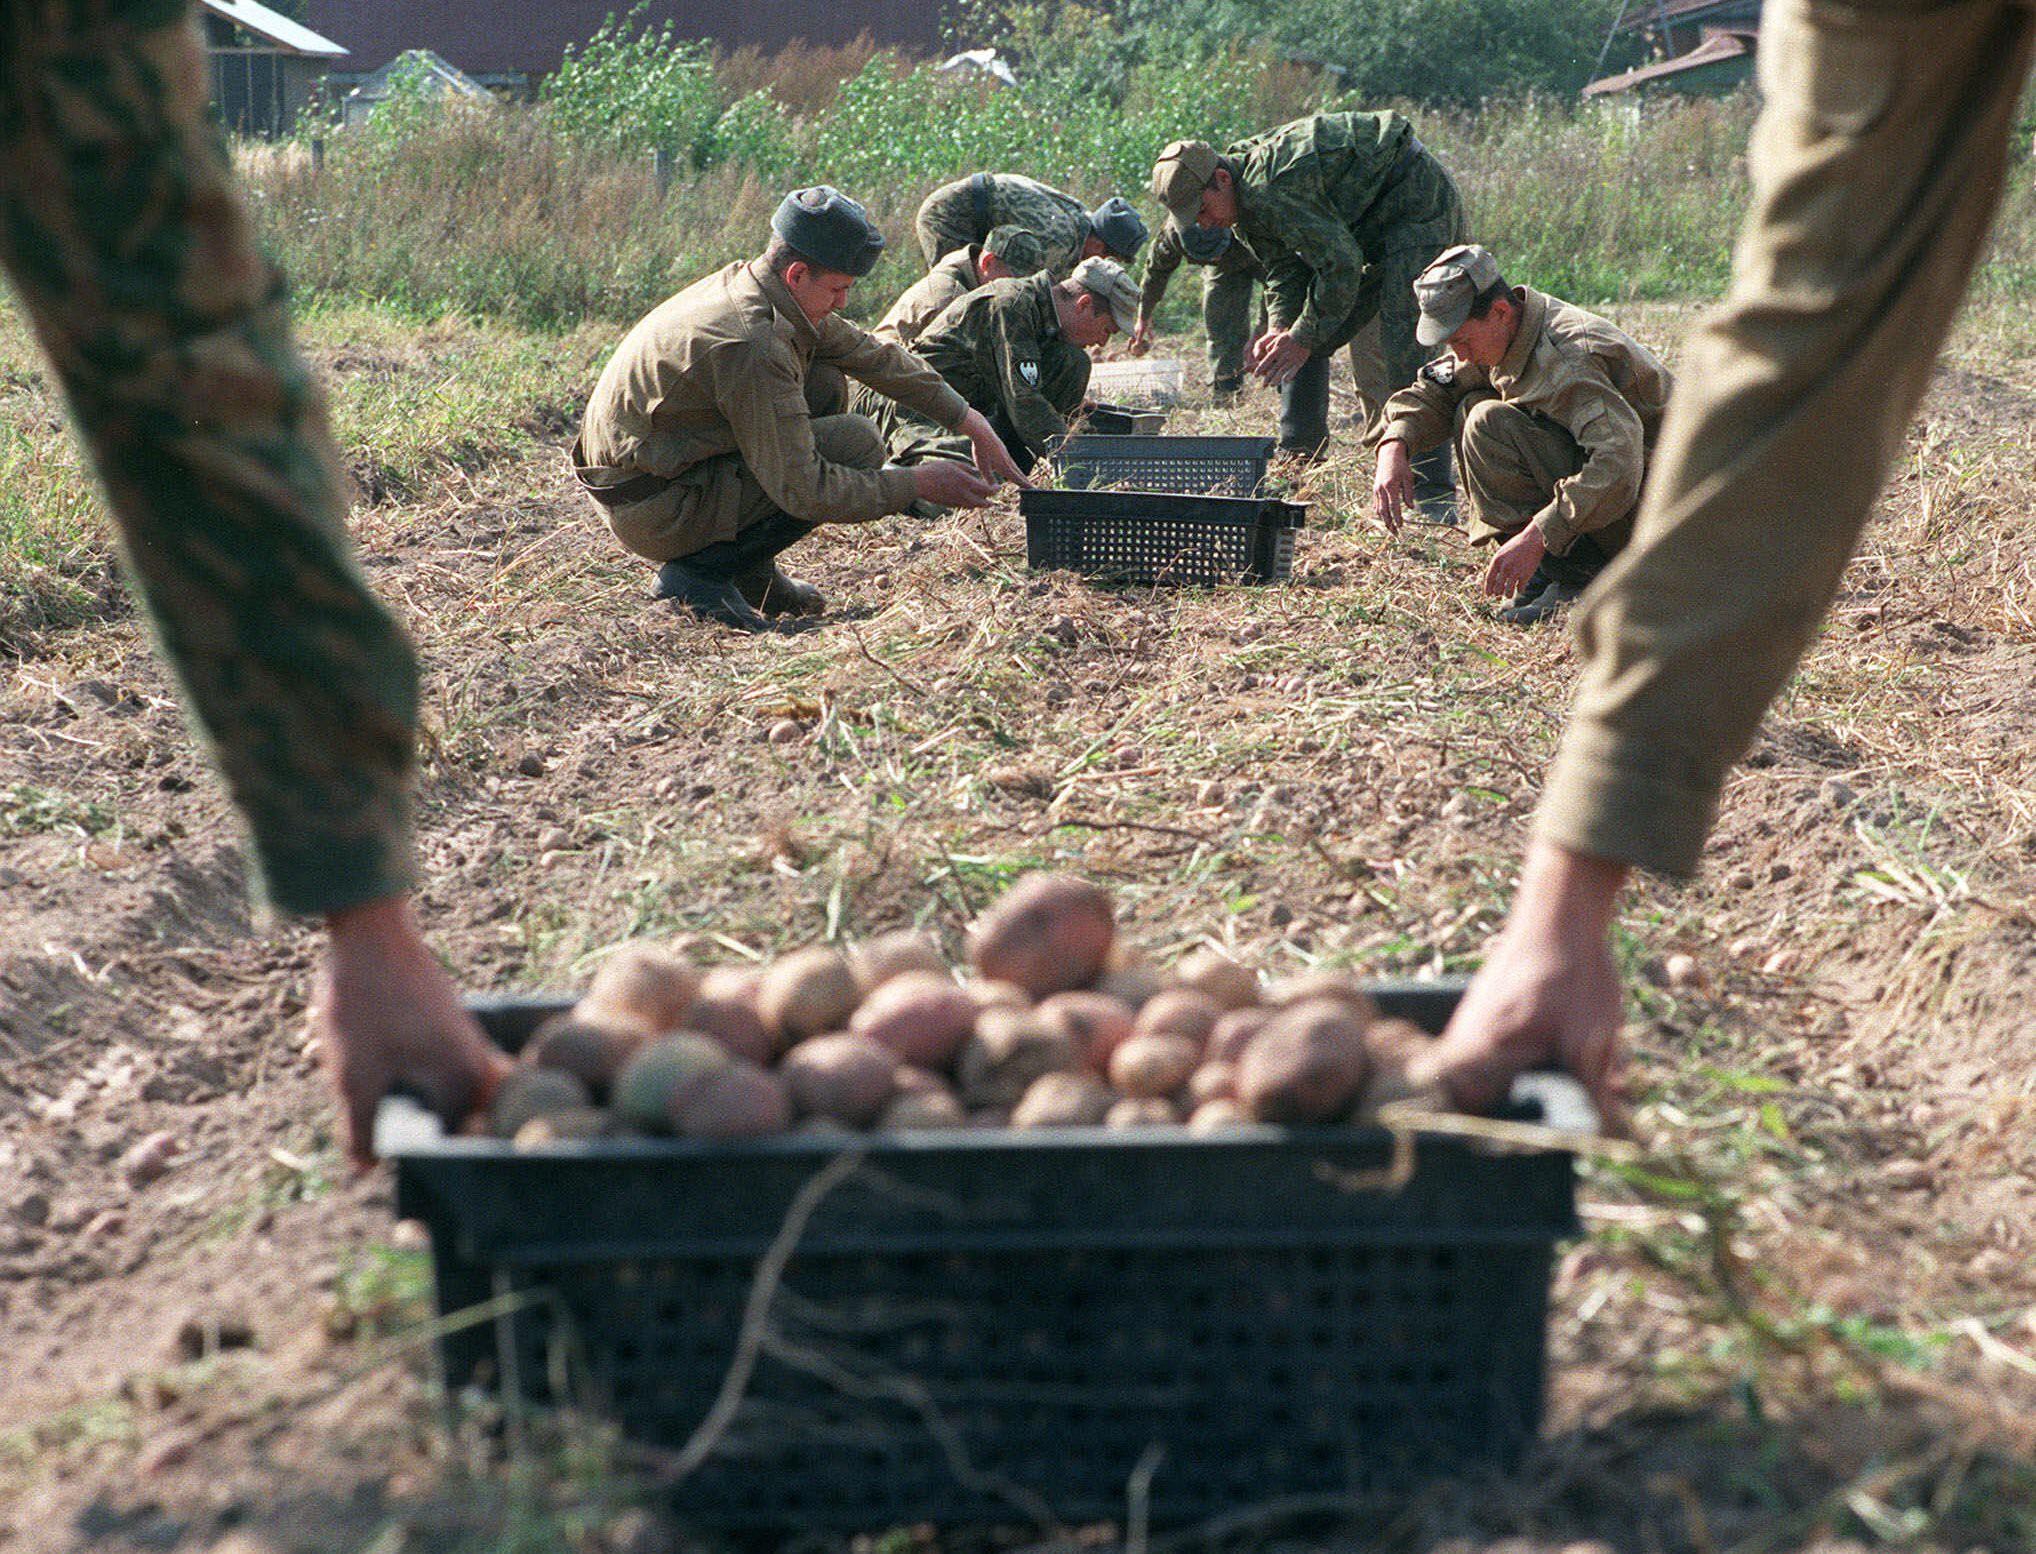 Potatoes in Russia